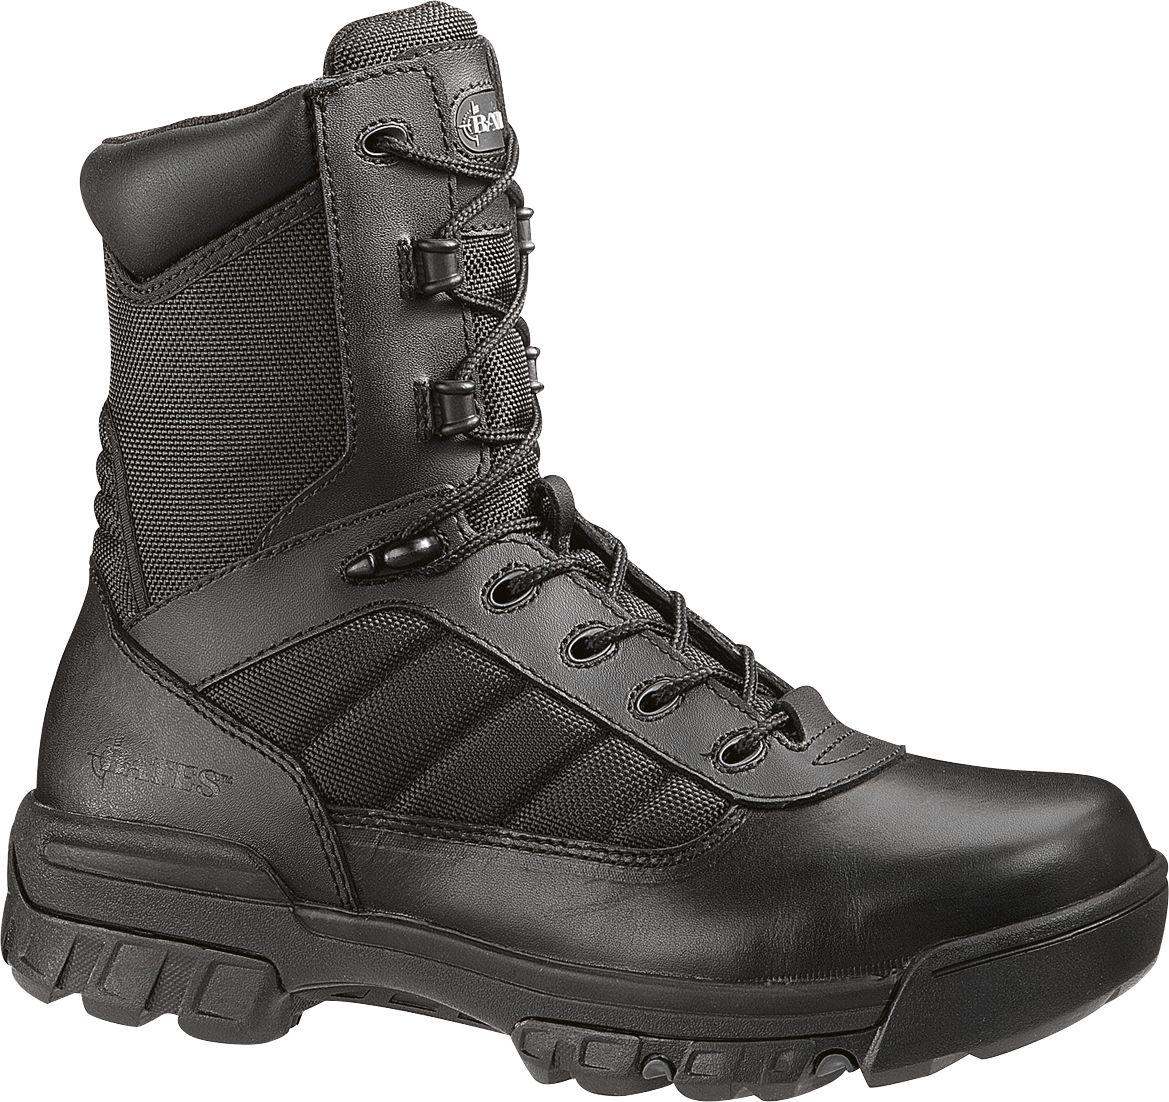 Mens Bates Tactical 8 Sport Composite Toe WaterResistant Side Zip Boots Black